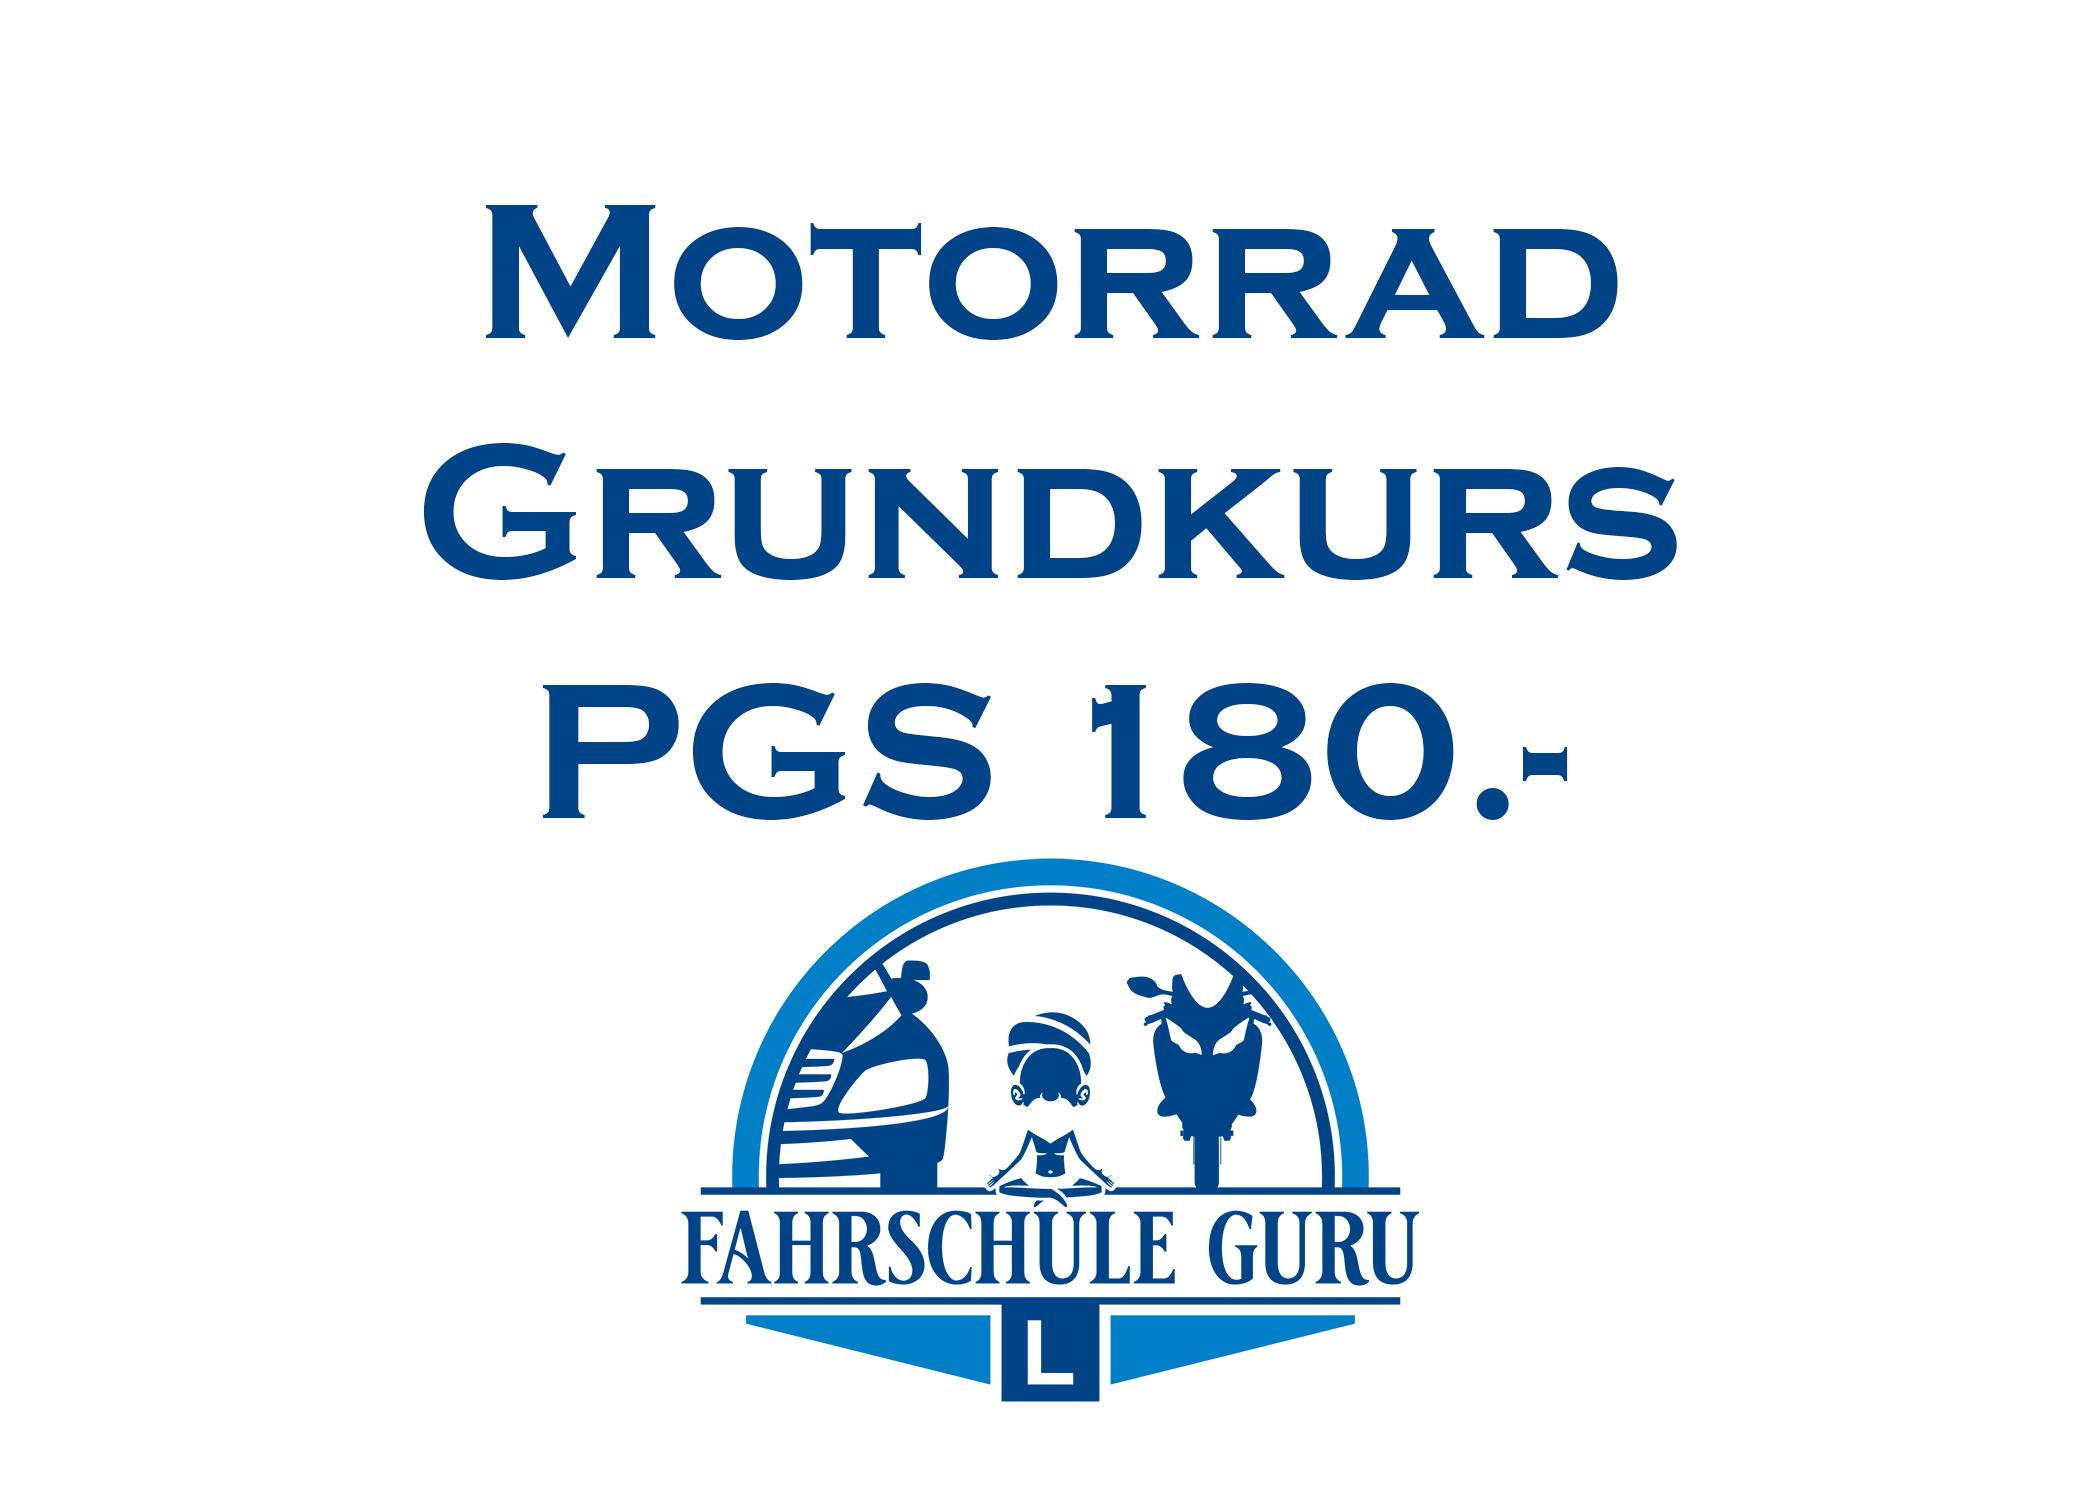 Motorradgrundkurs PGS (pro Teil) CHF 180.-